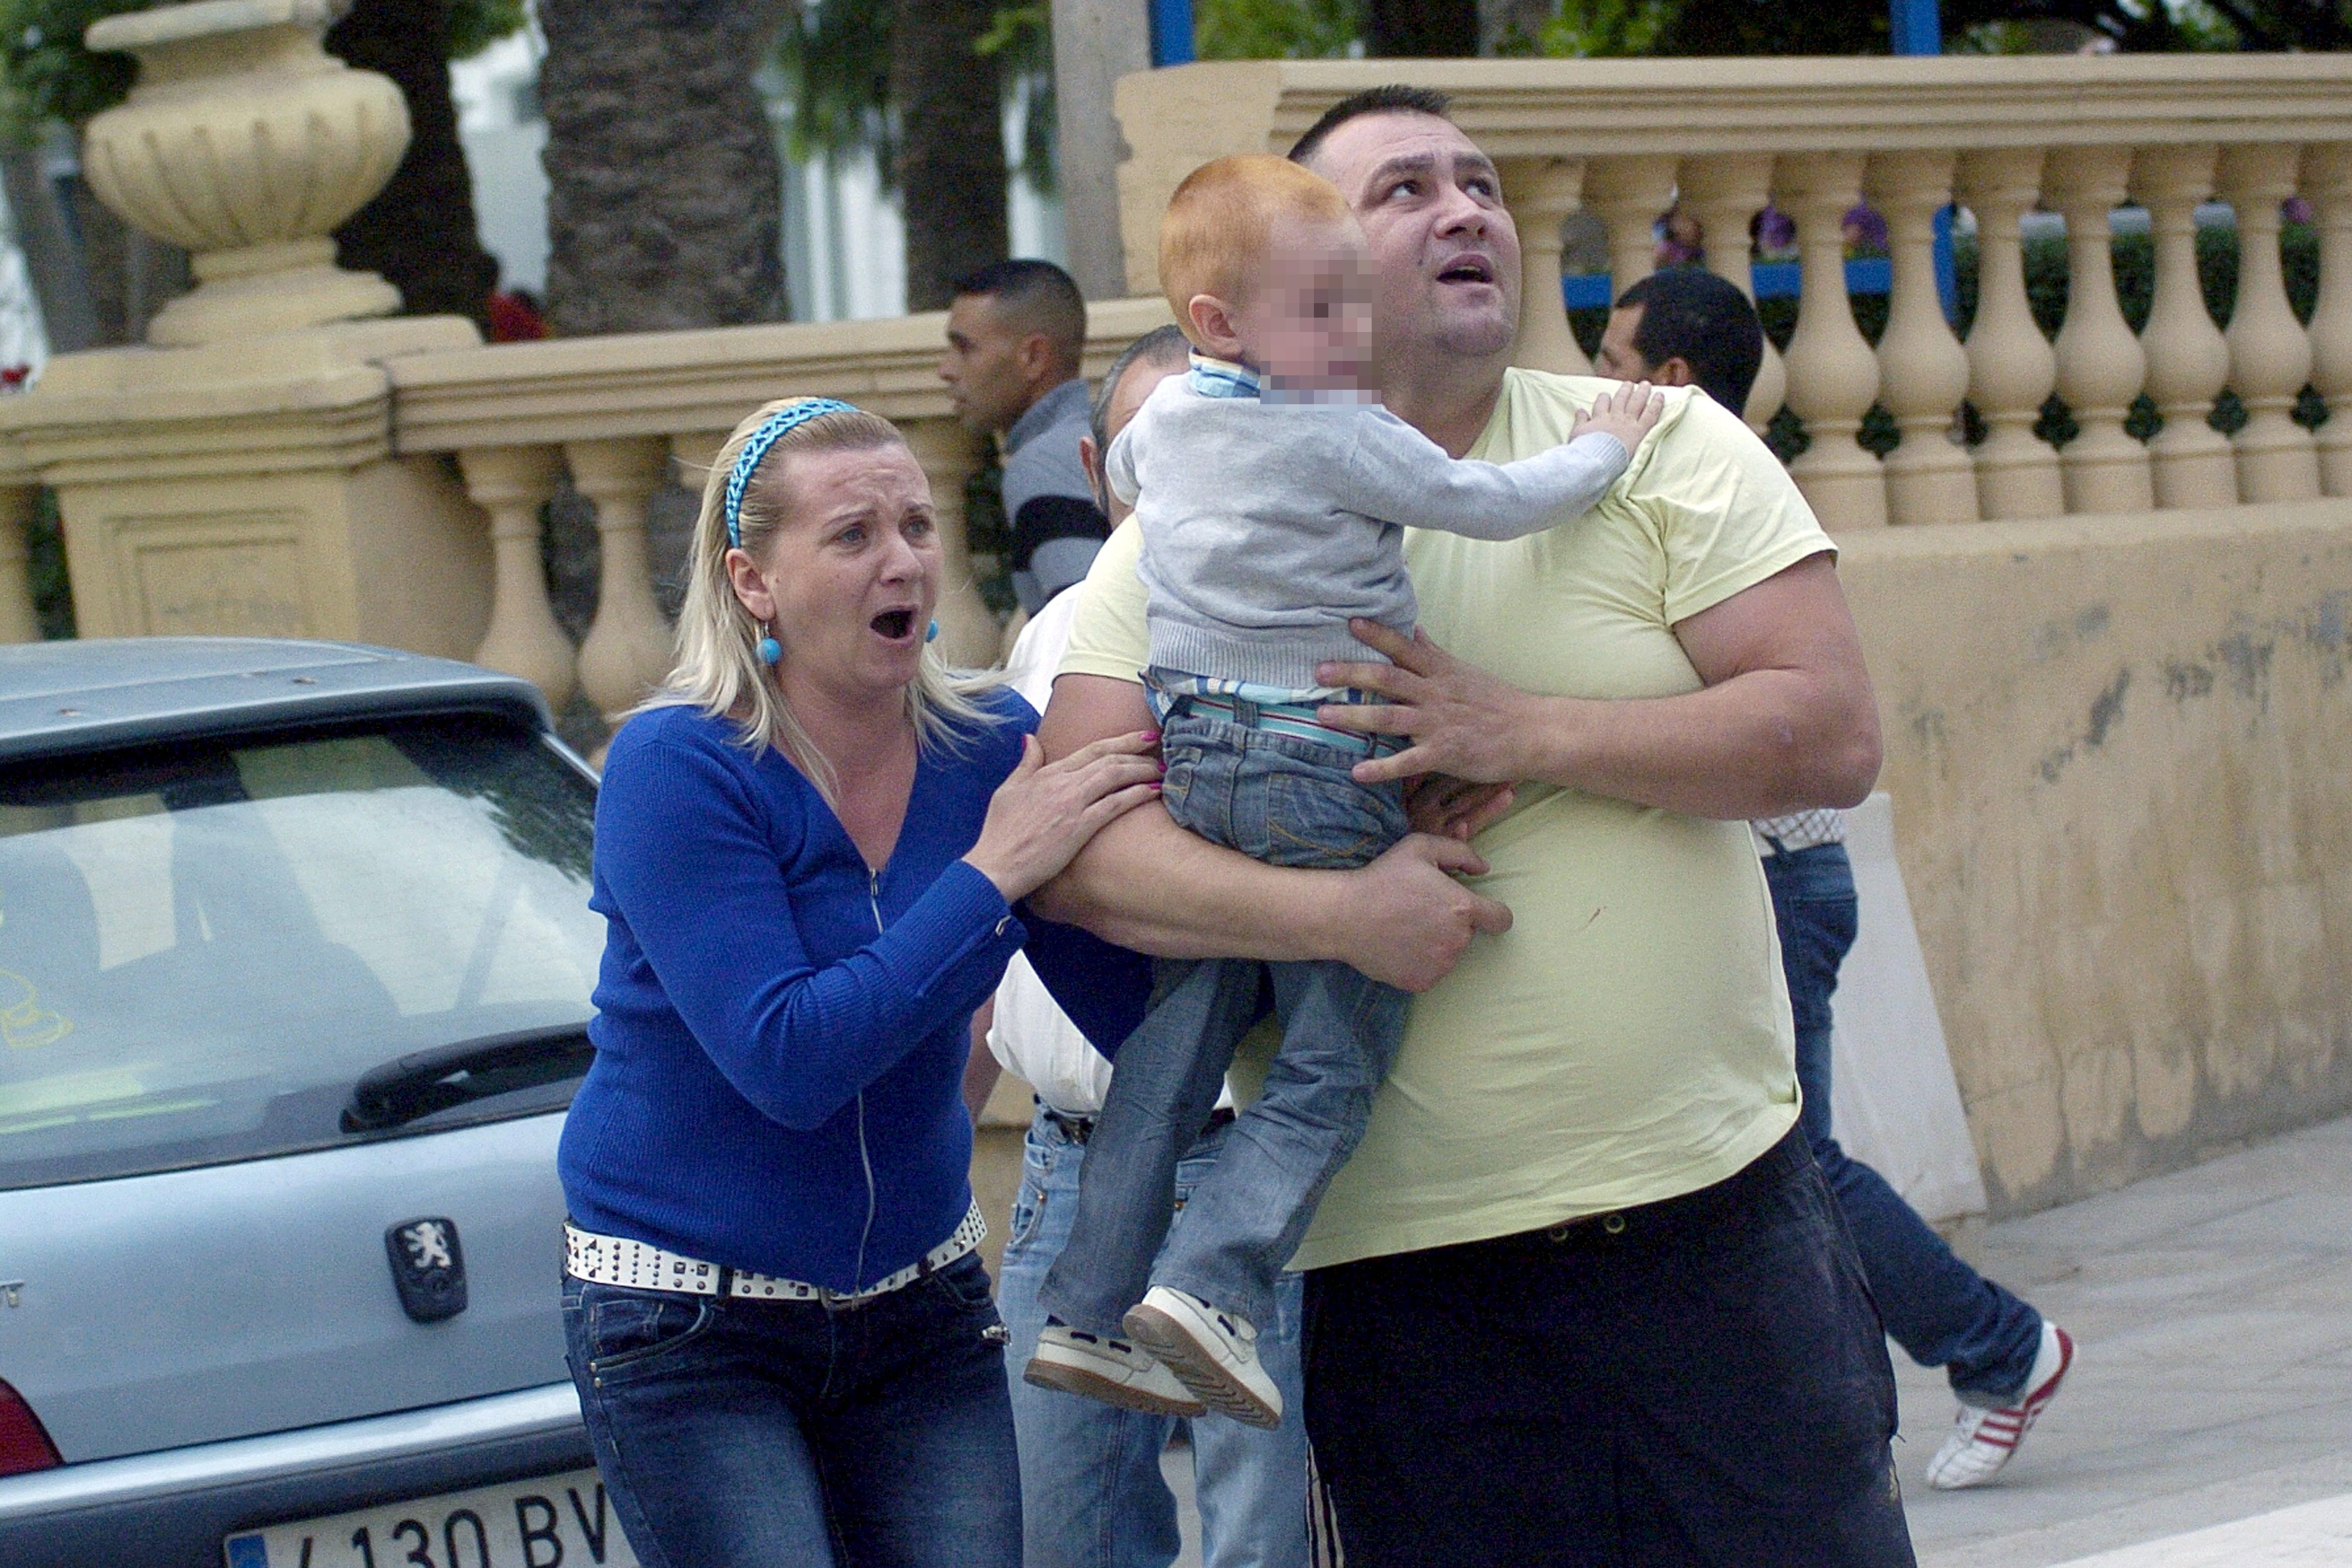 Un terremoto azota lorca murcia abc espaa - Lorca murcia fotos ...